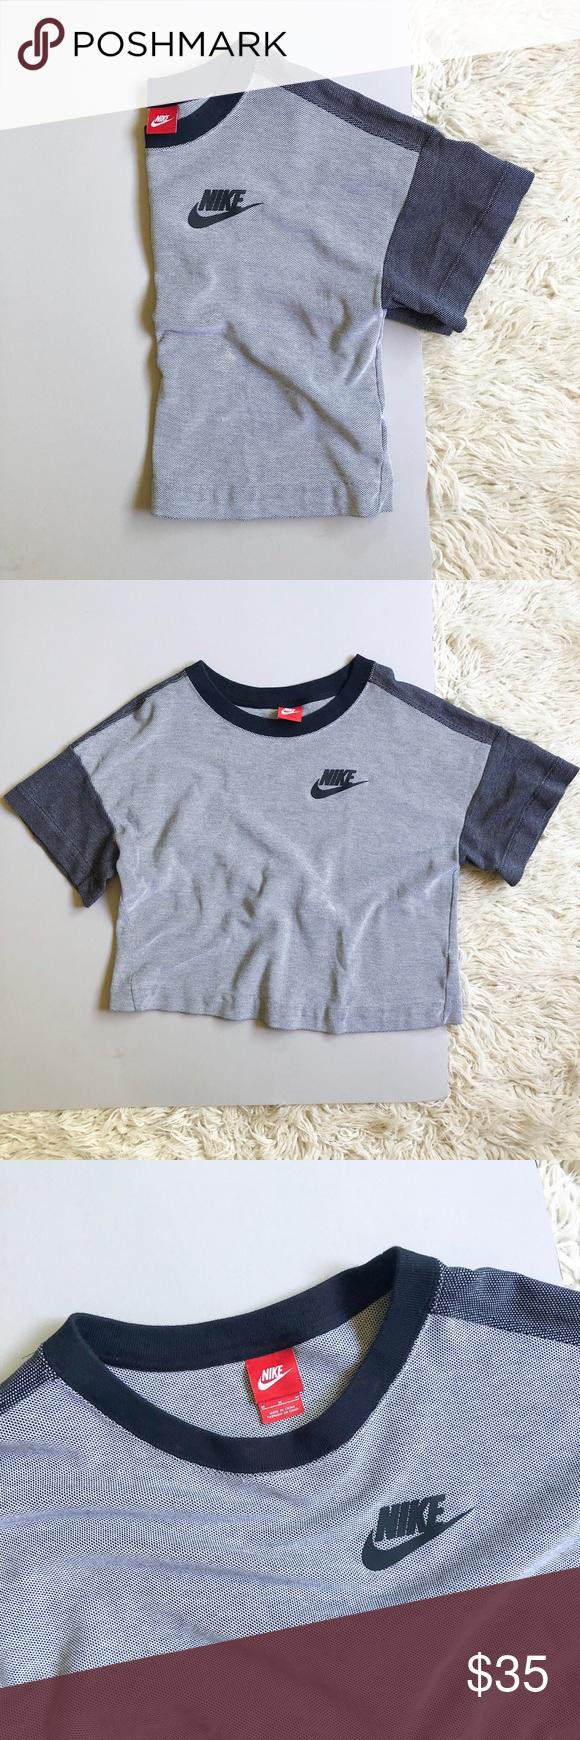 Nike Cropped Short Sleeve Textured Sweatshirt M Texture Sweatshirt Color Block Sweatshirt Sweatshirts [ 1740 x 580 Pixel ]